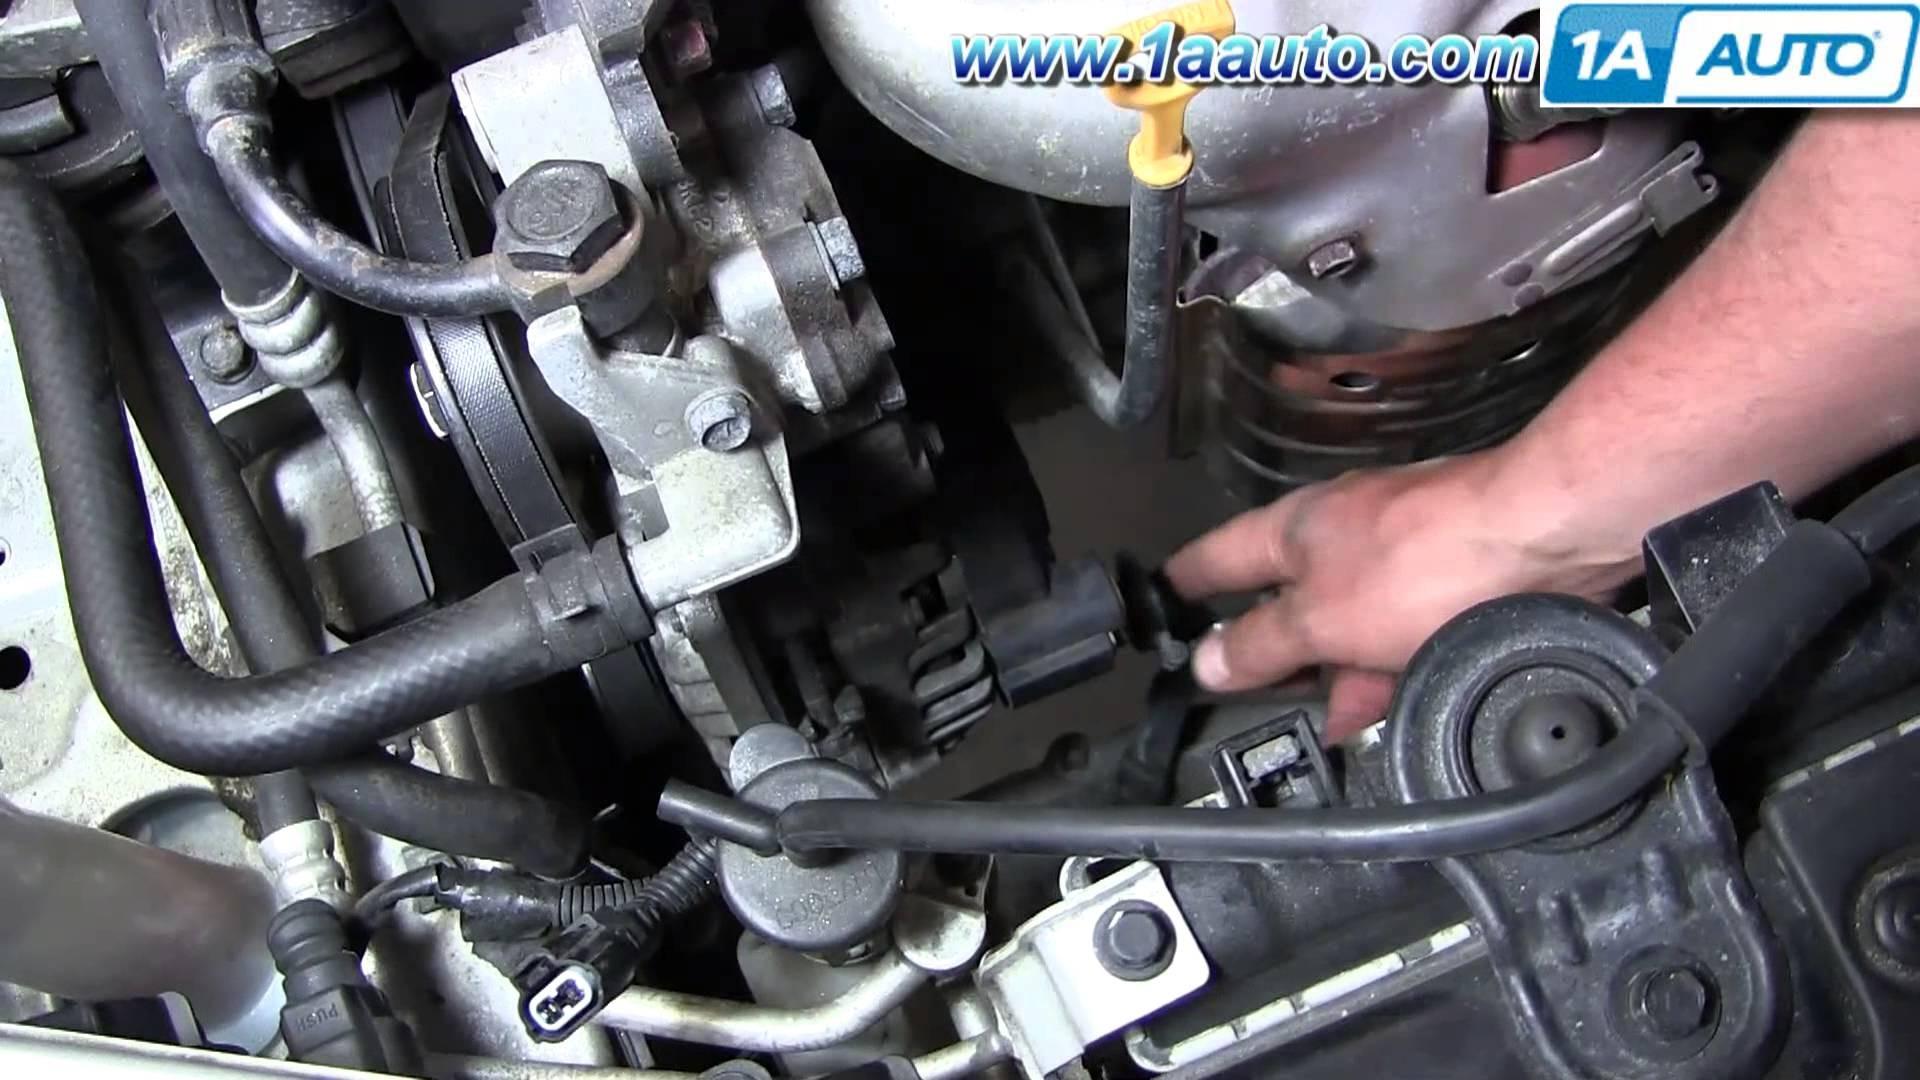 2002 hyundai elantra engine diagram 5050 rgb led strip wiring how to install replace